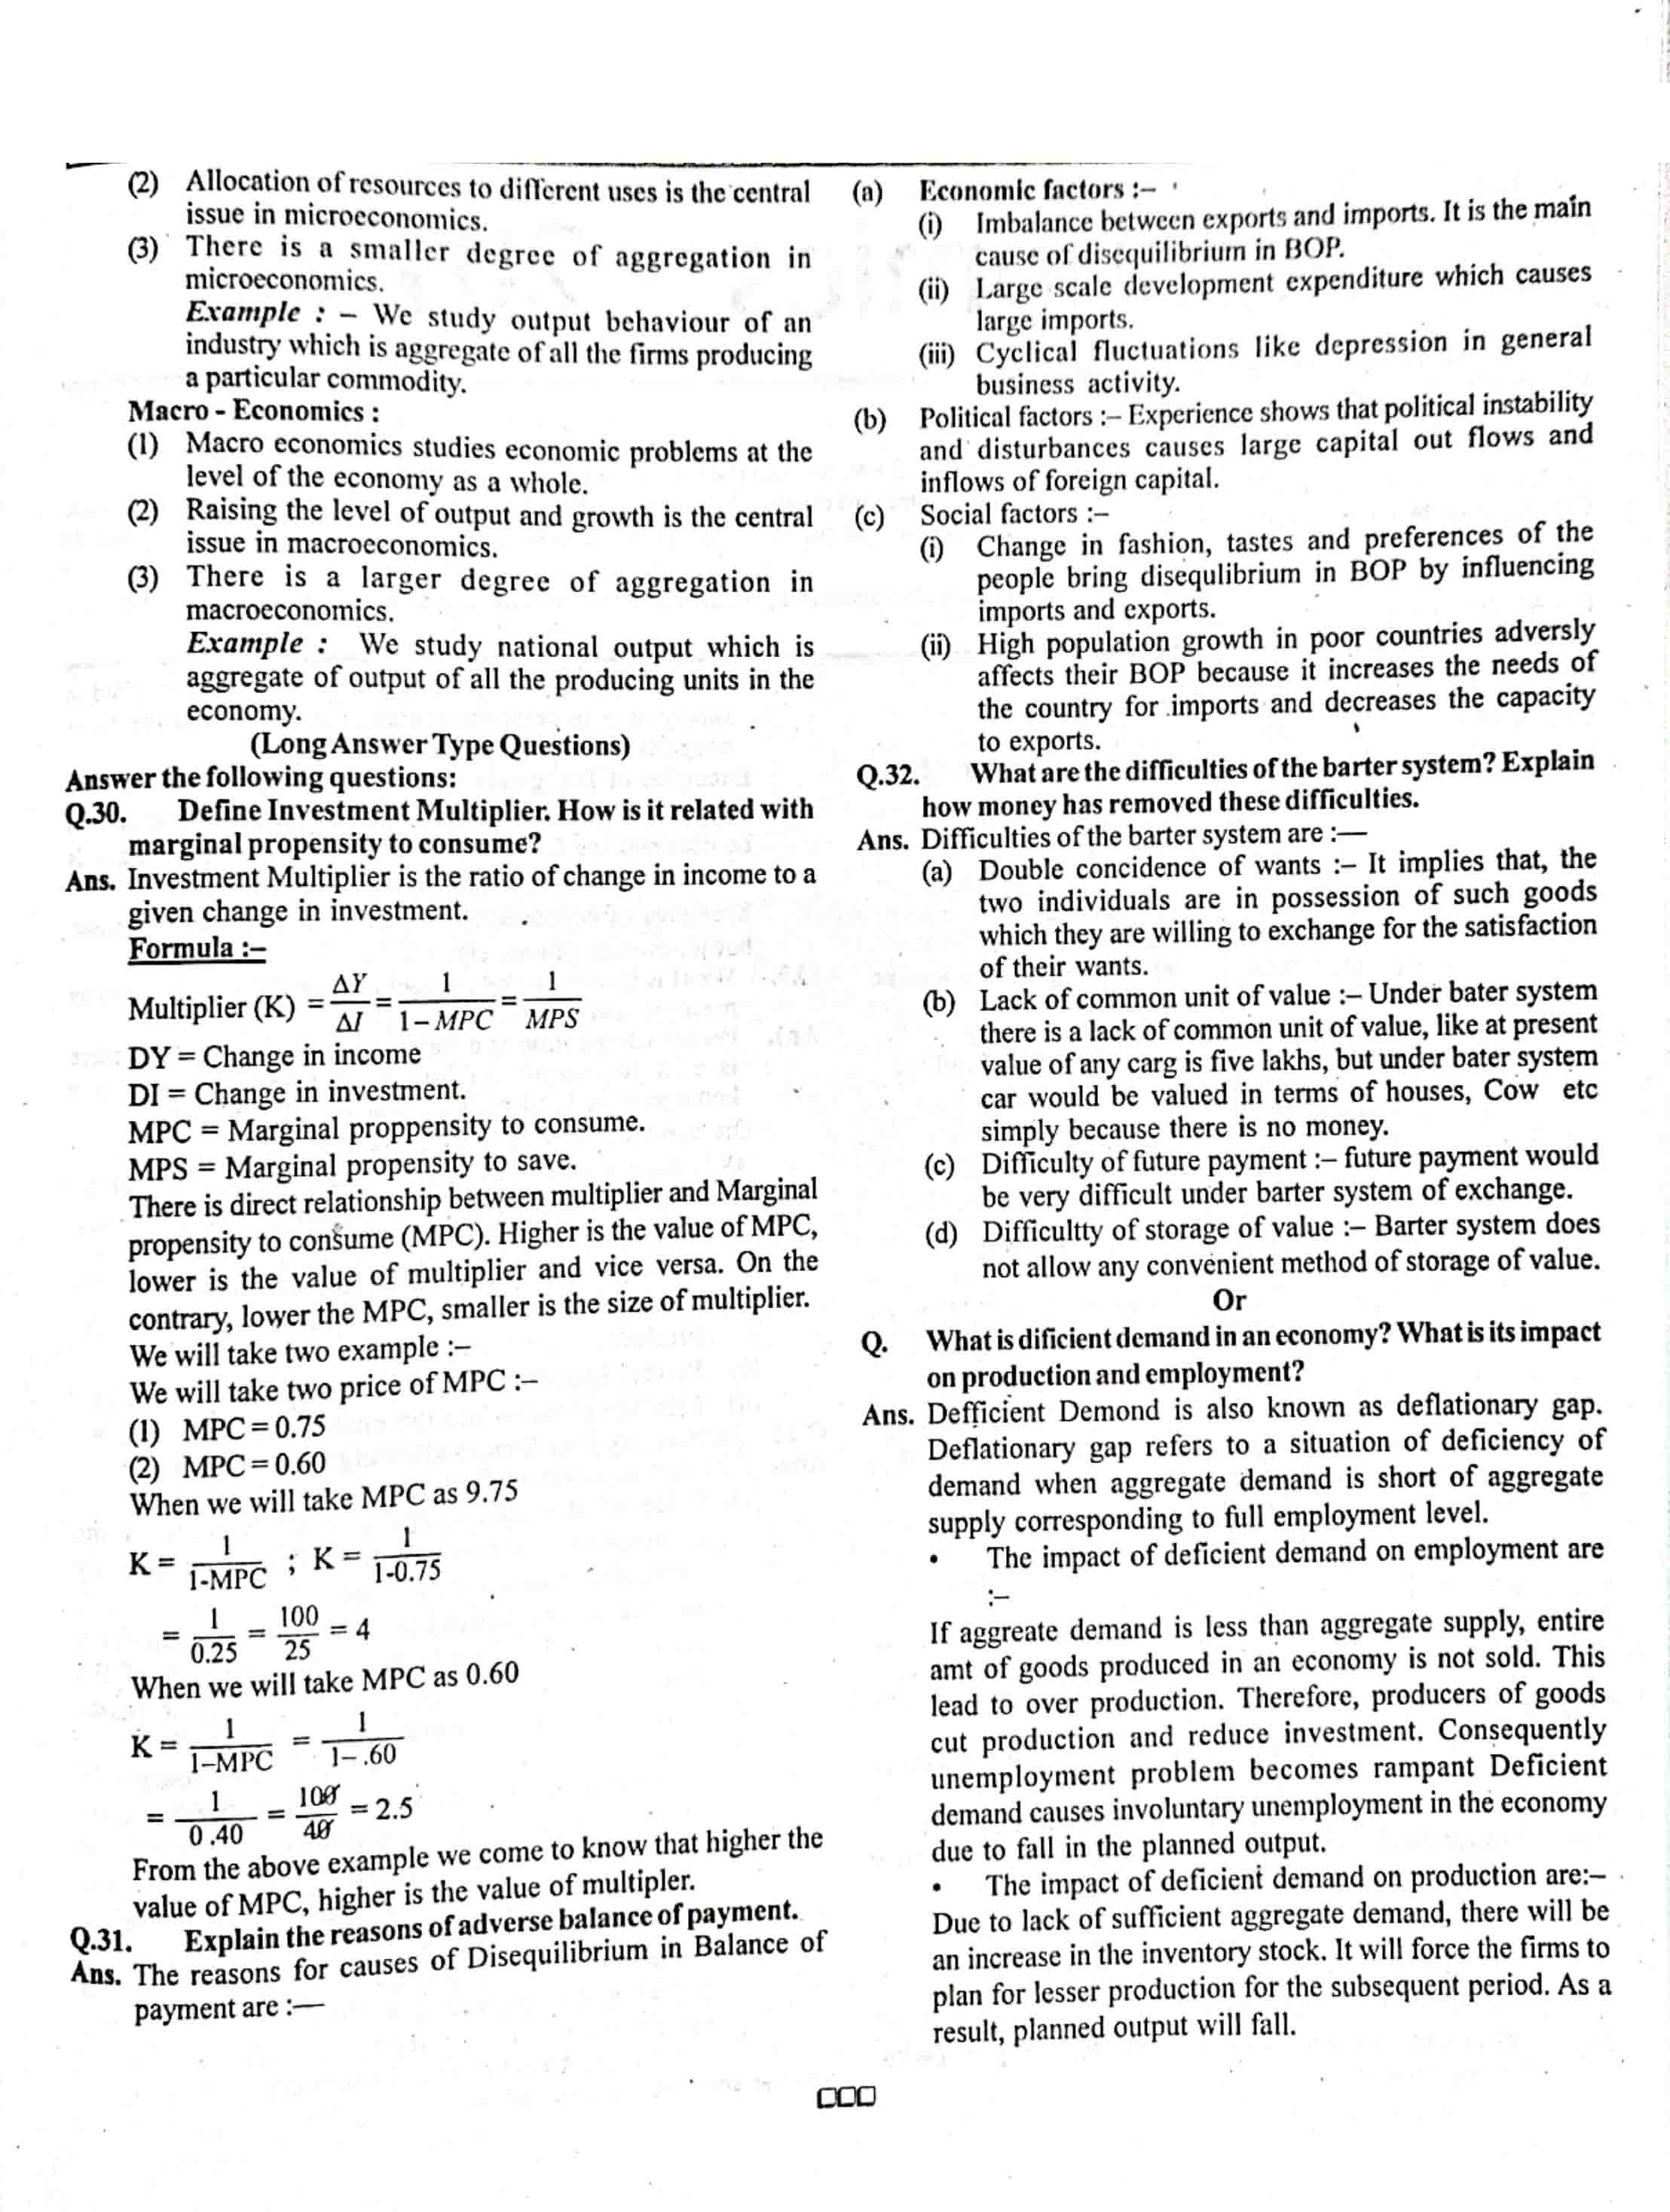 JAC Class 12 economics 2017 Question Paper 04